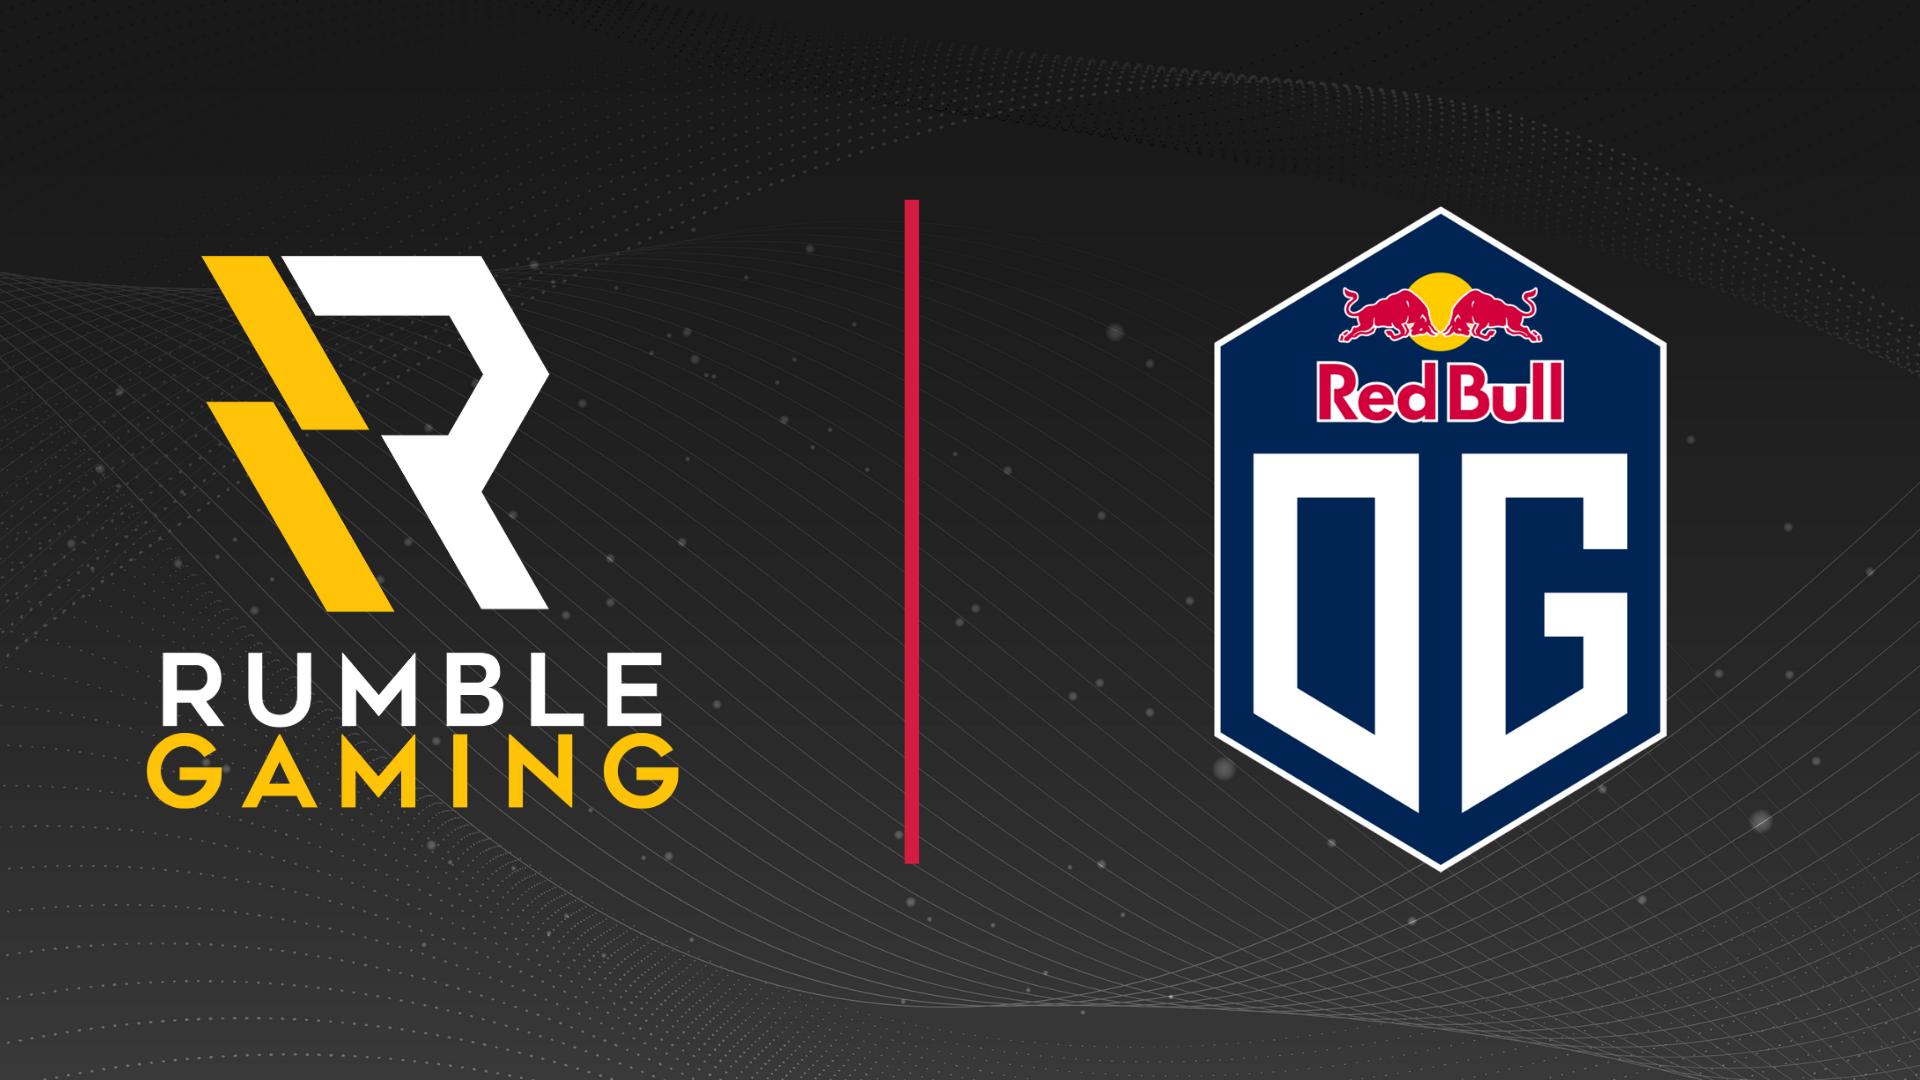 OG Esports x Rumble Gaming